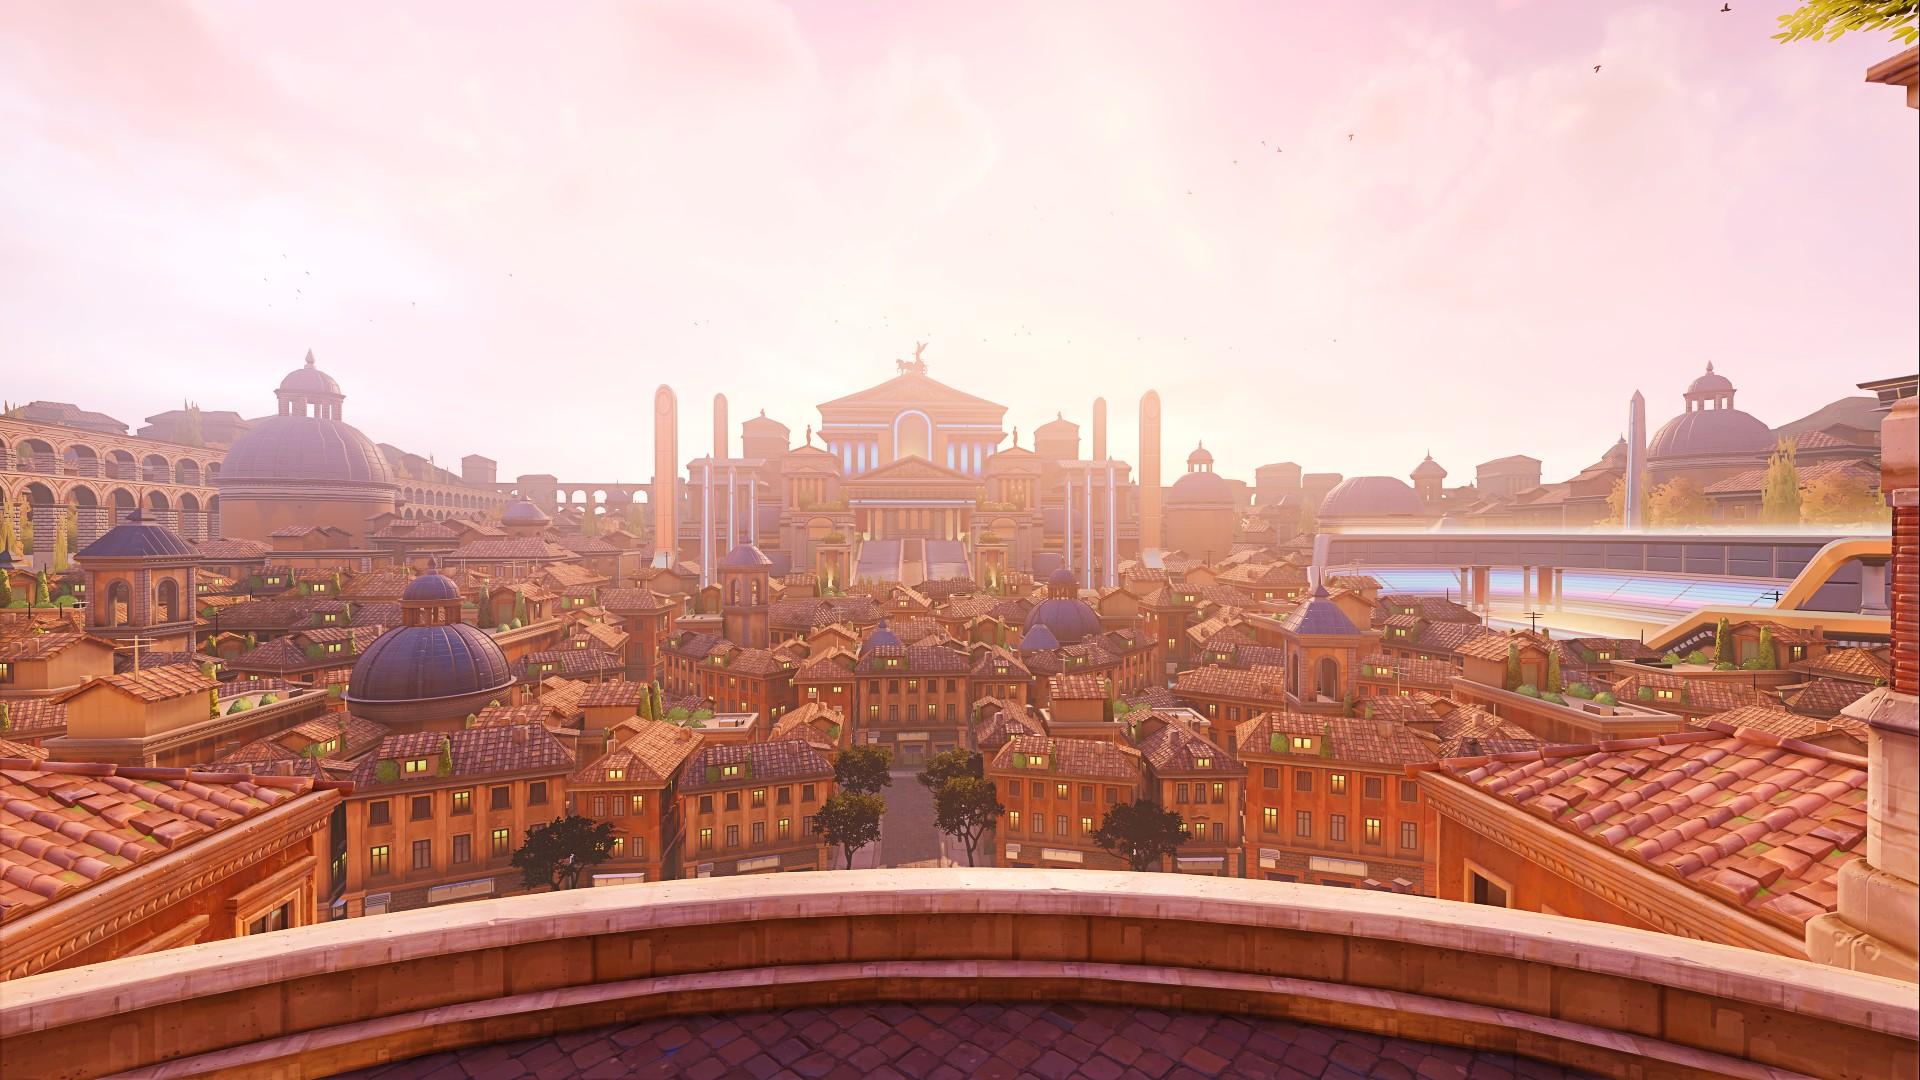 Overwatch 2 devs show off New York, Rome, and new hero designs